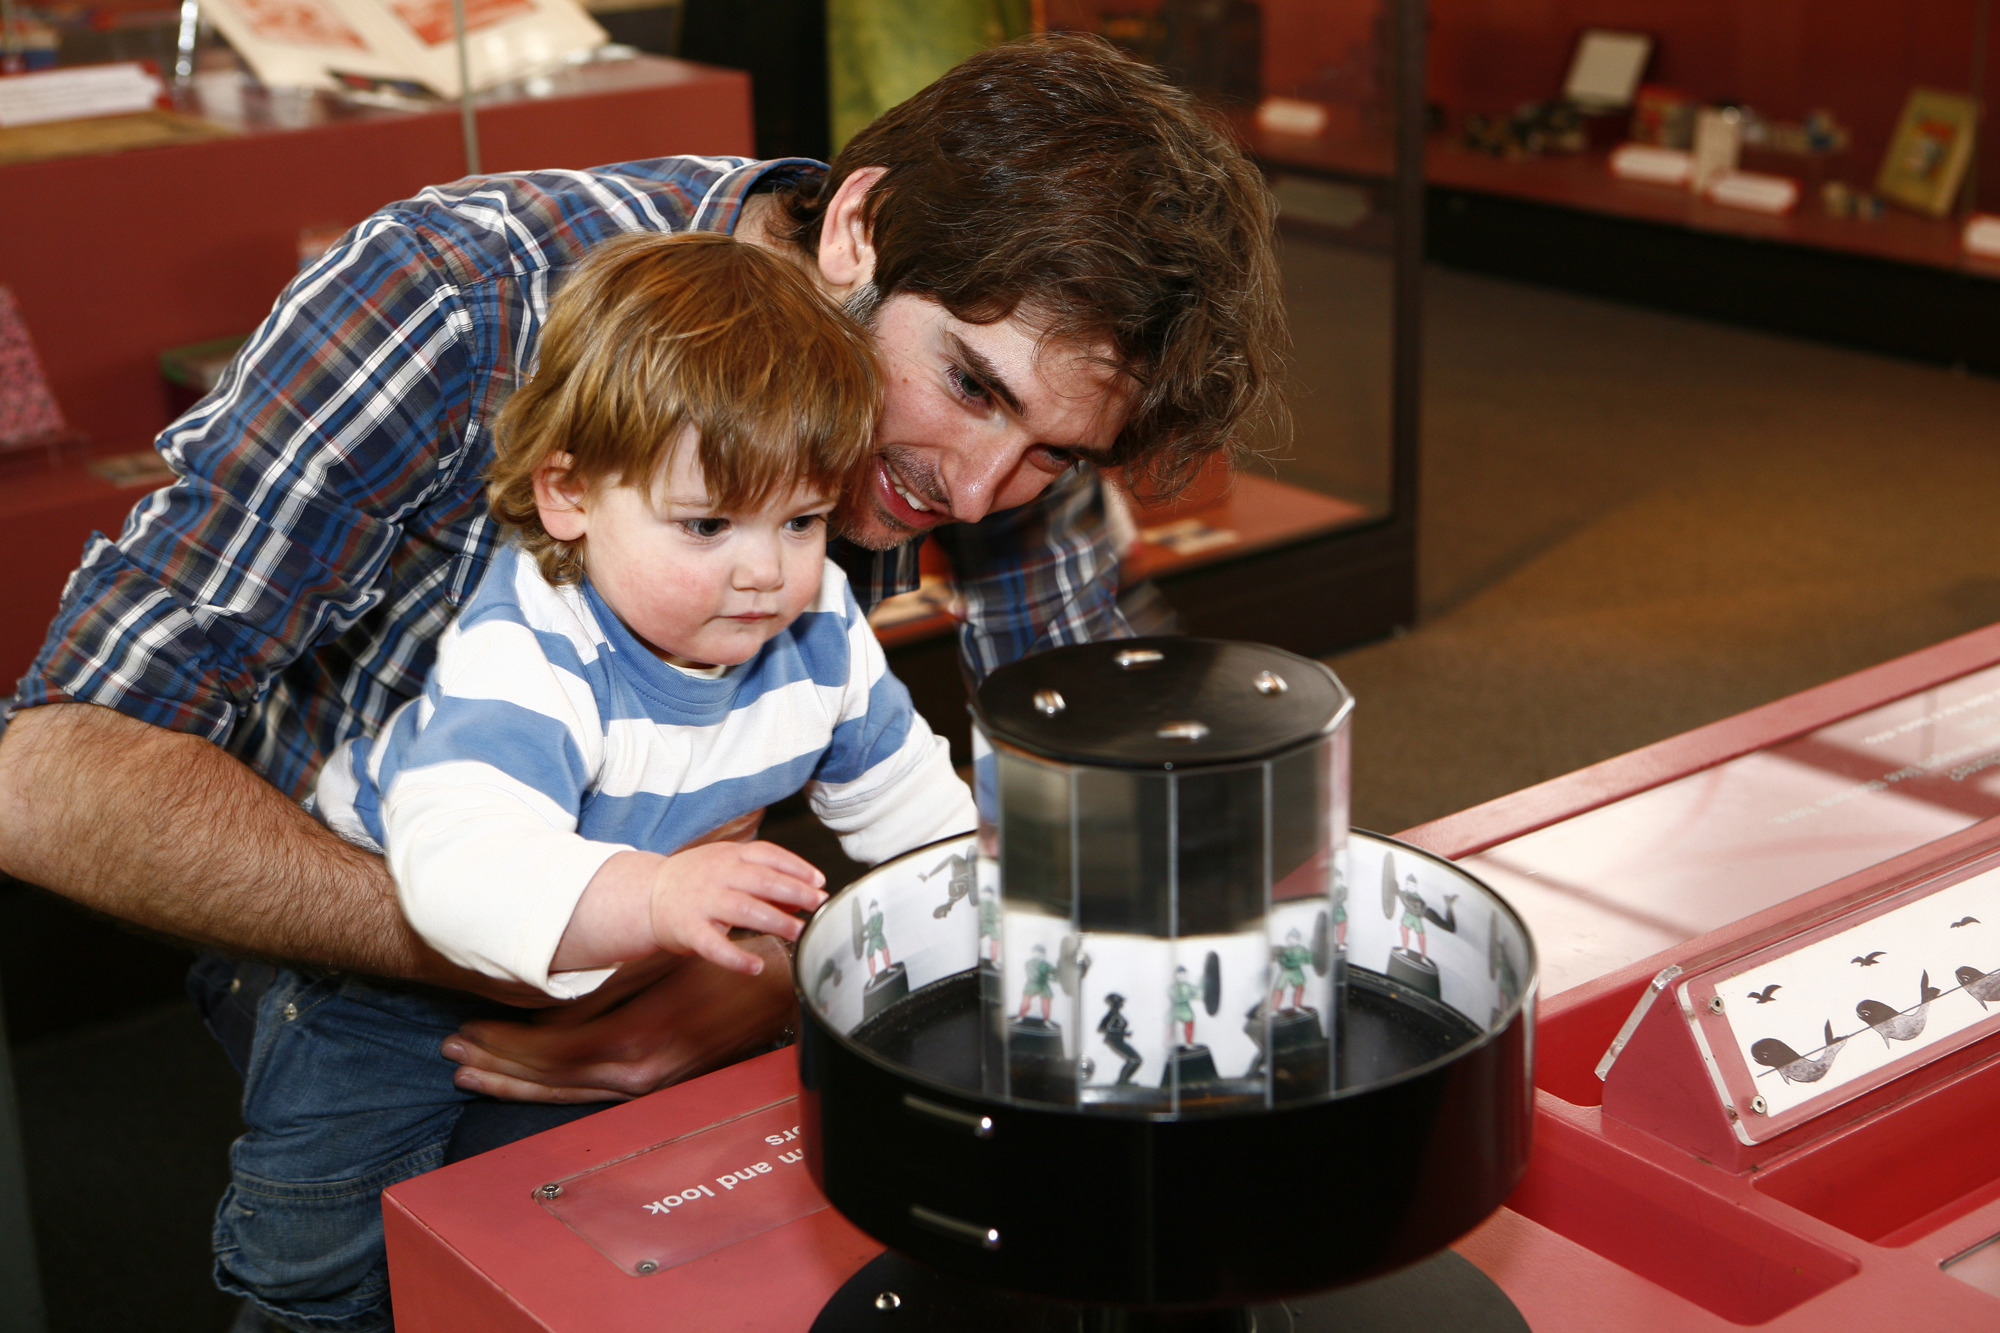 V&A Museum of Childhood Sensory Pod